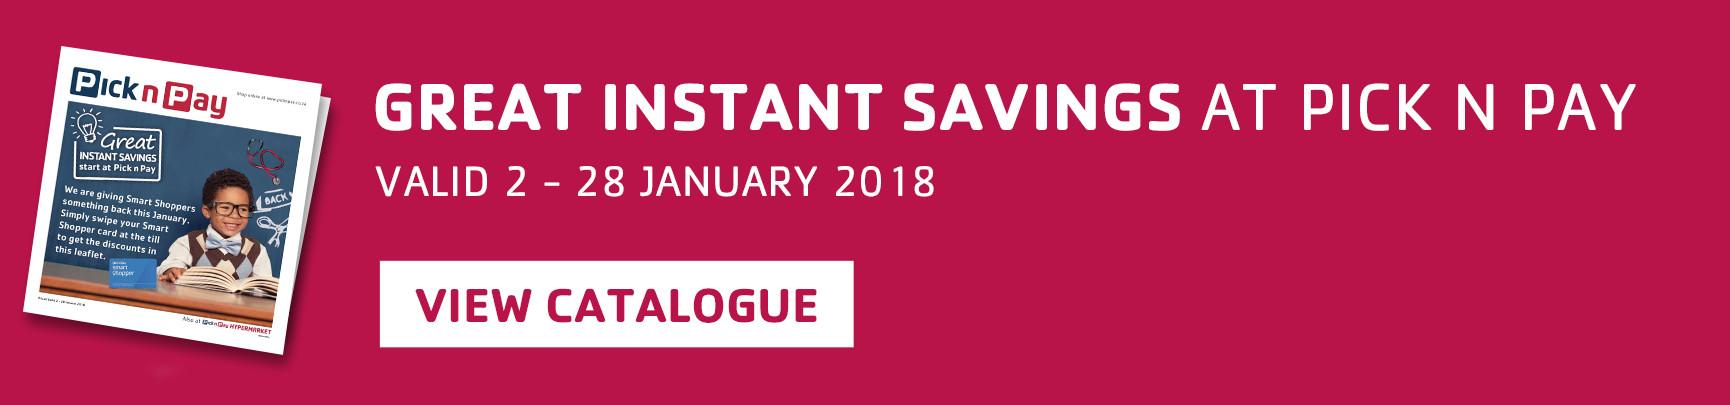 GREAT INSTANT SAVINGS AT PICK N PAY 2018.jpg